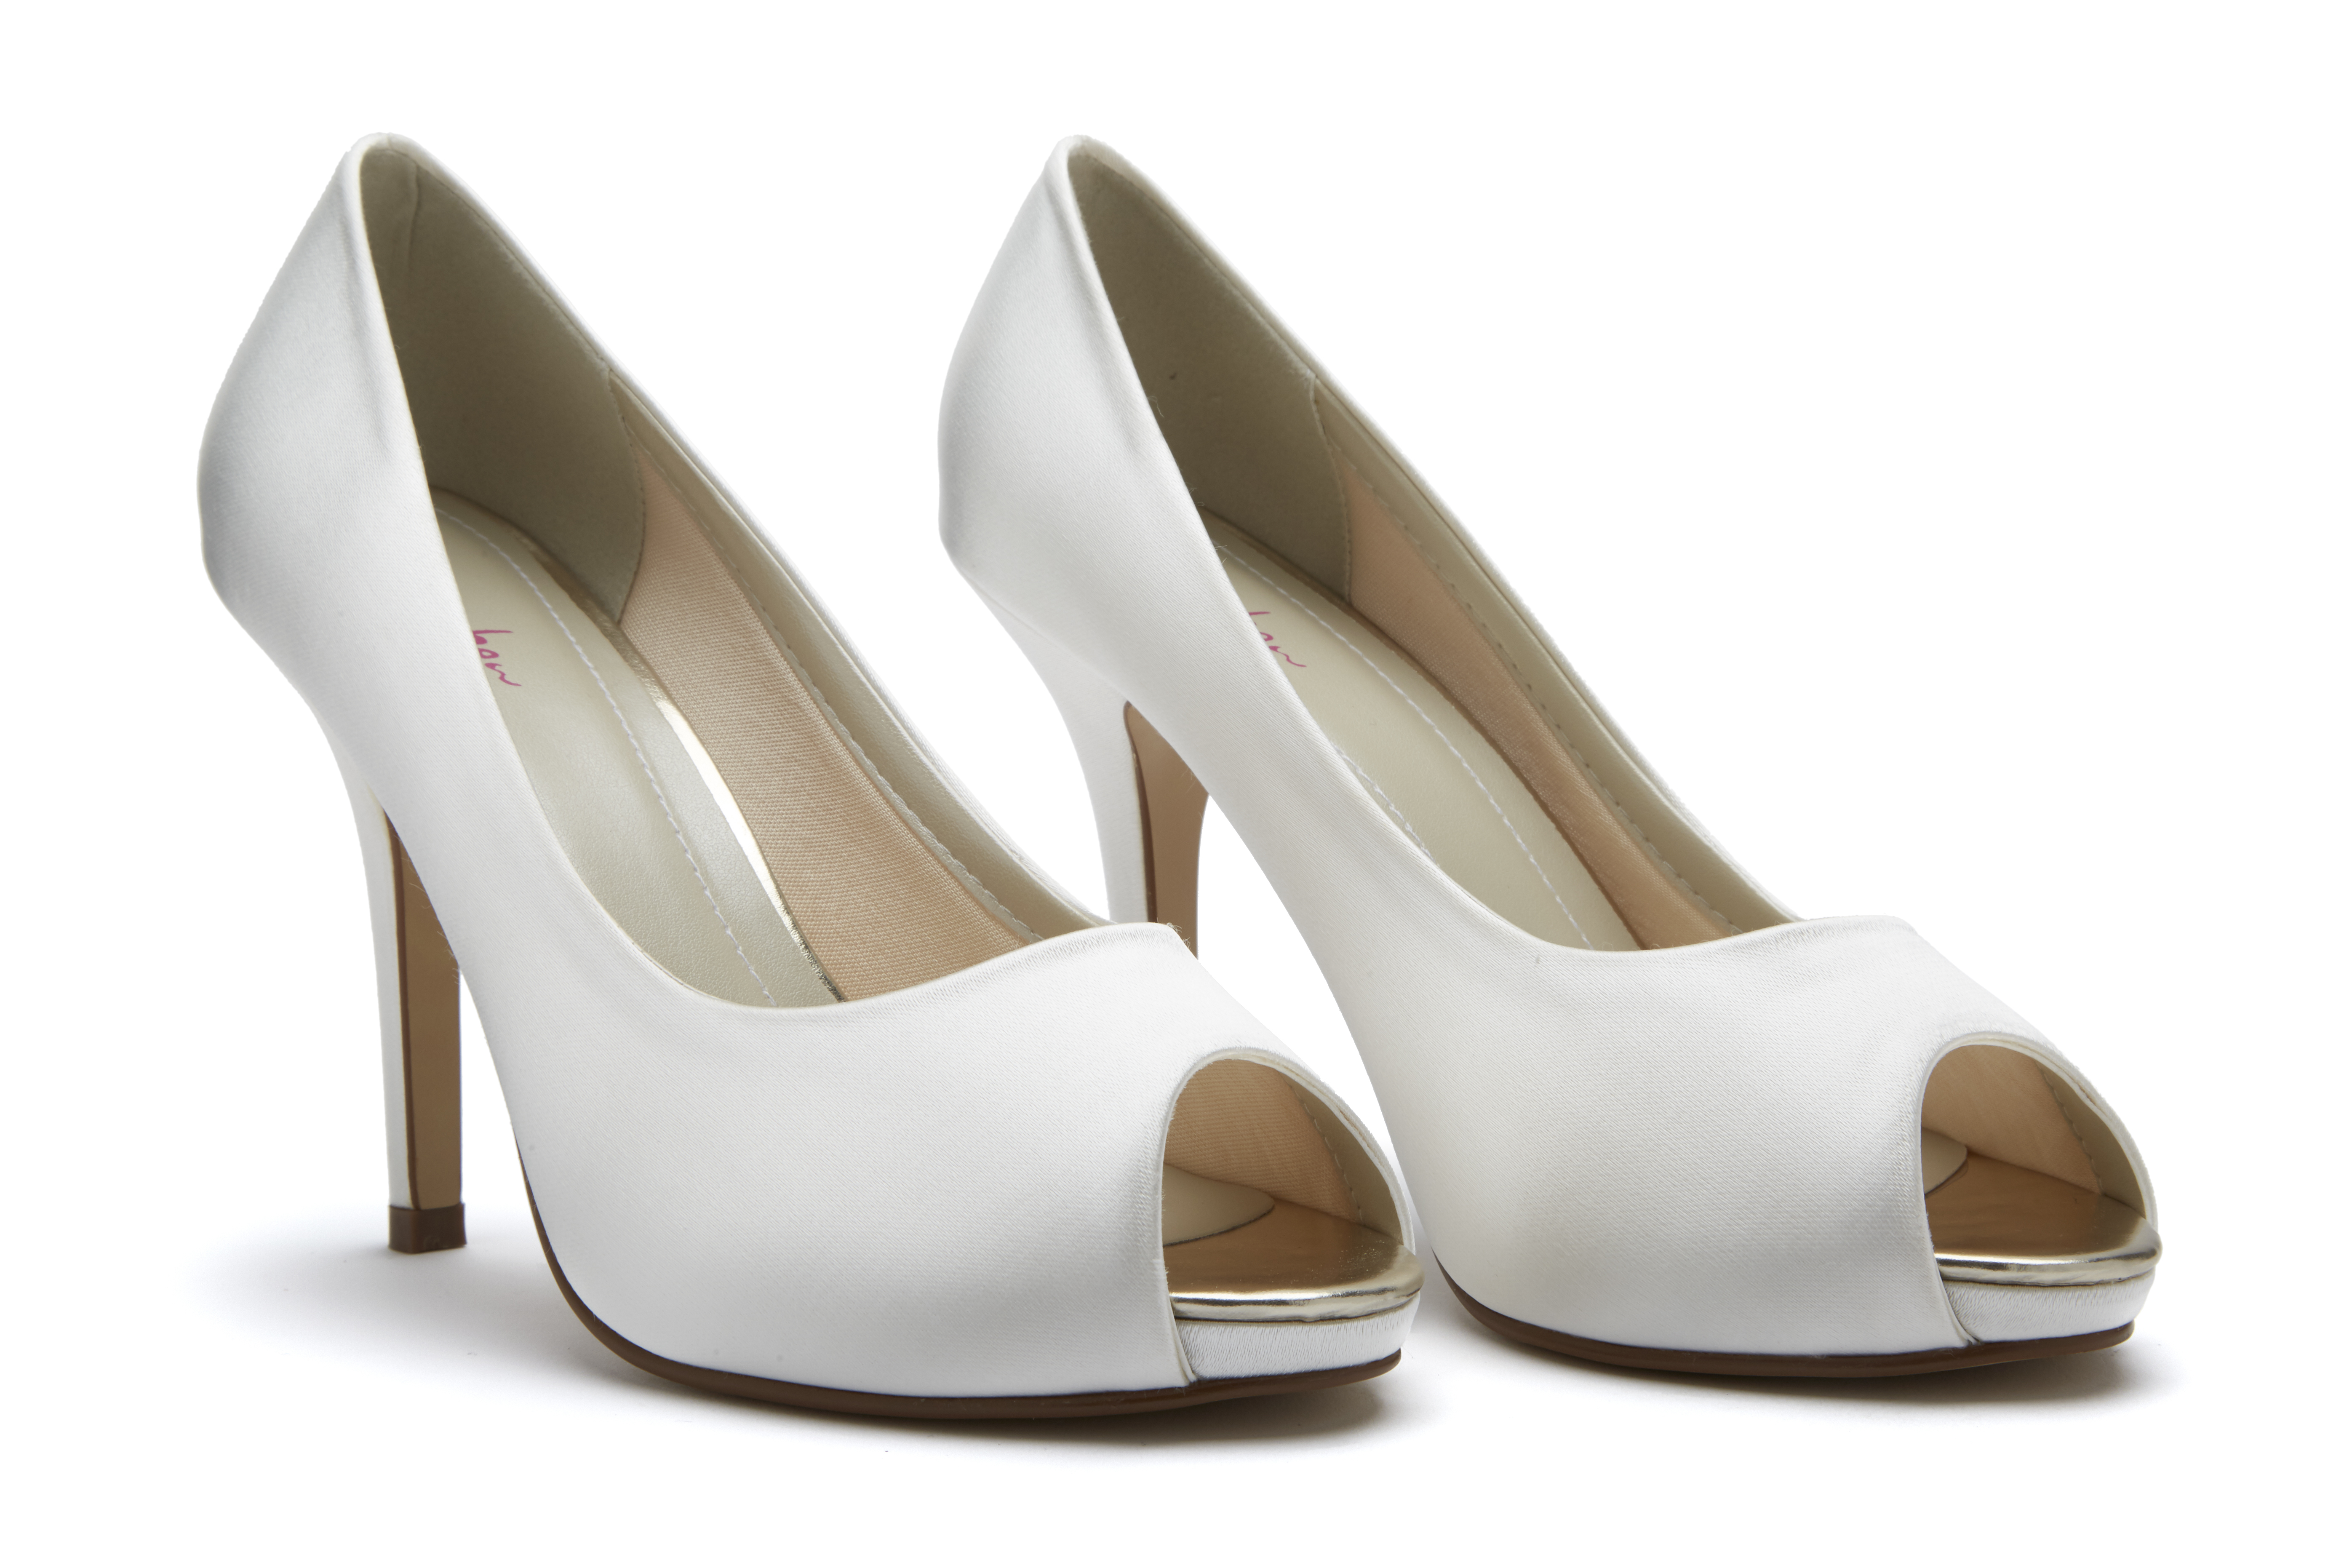 2917cf26d315 Jennifer. White. Heel Height 10.5 cm. Dyeable Ivory Satin. A gorgeous peep  toe court shoe ...